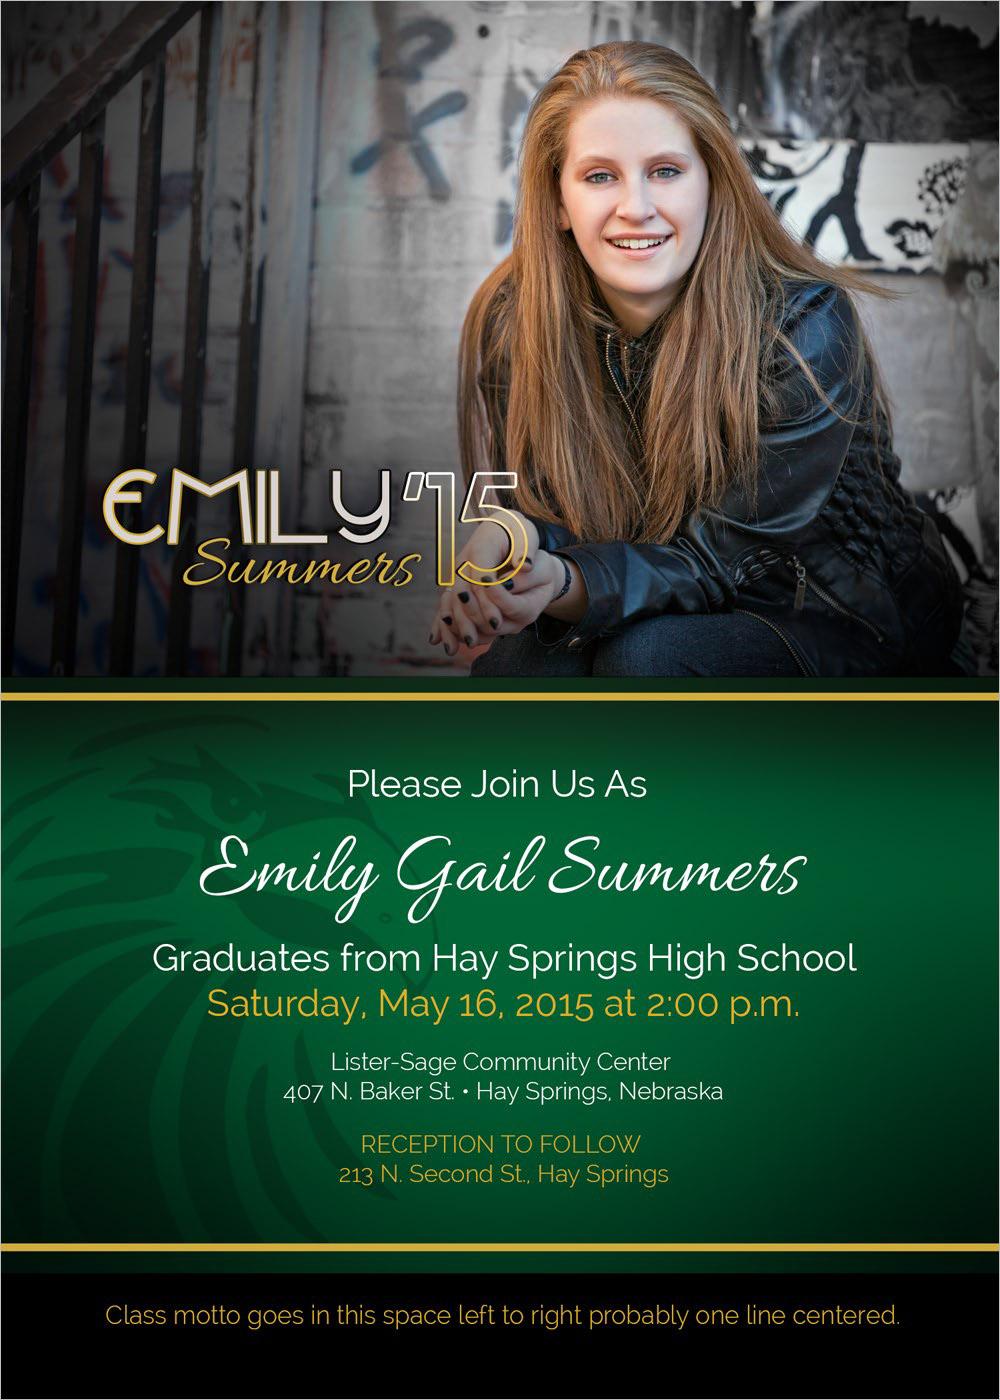 Summers Graduation Announcement Hay Springs, NE